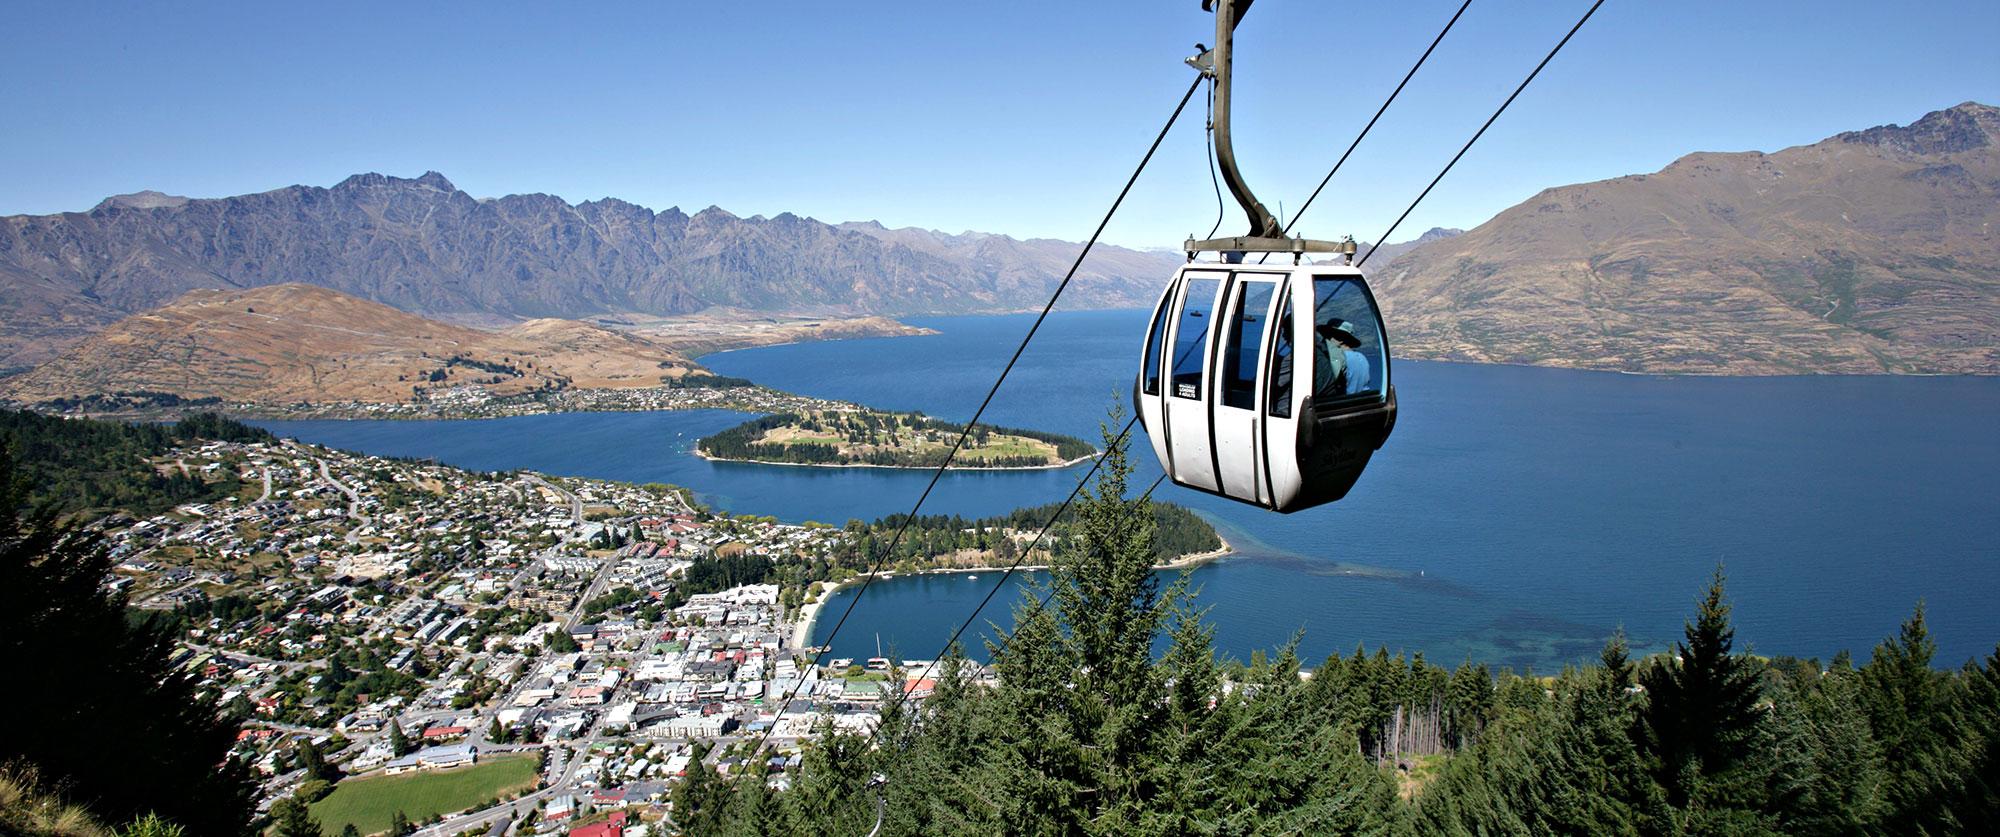 New Zealand Family Vacation: Queenstown Adventure